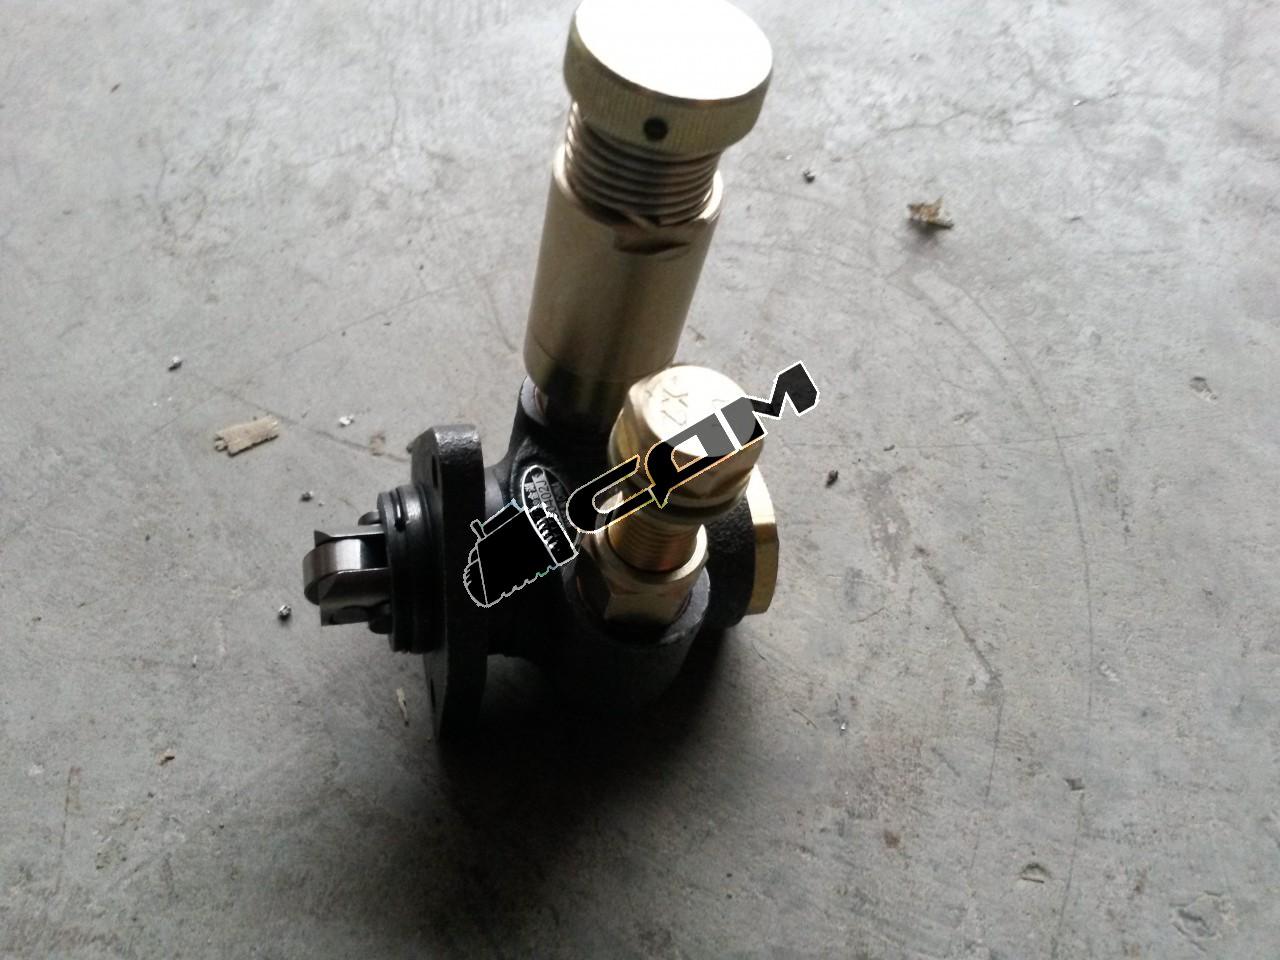 Насос топливо-подкачивающий низкого давления (ТННД)  CDM 833 13030186